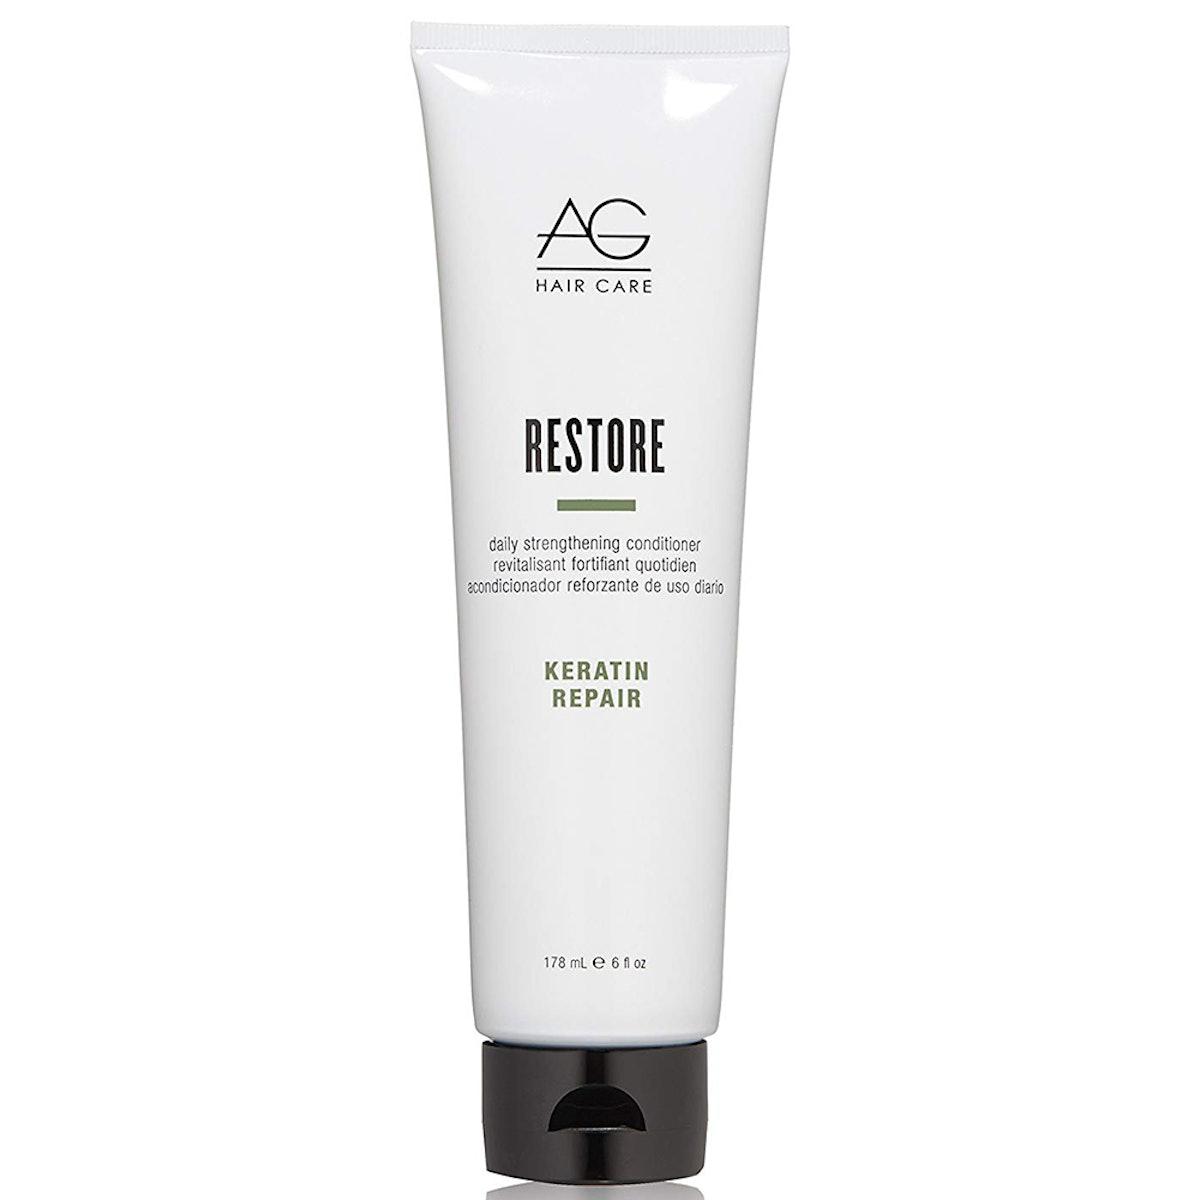 AG Hair Keratin Repair Restore Daily Strengthening Conditioner